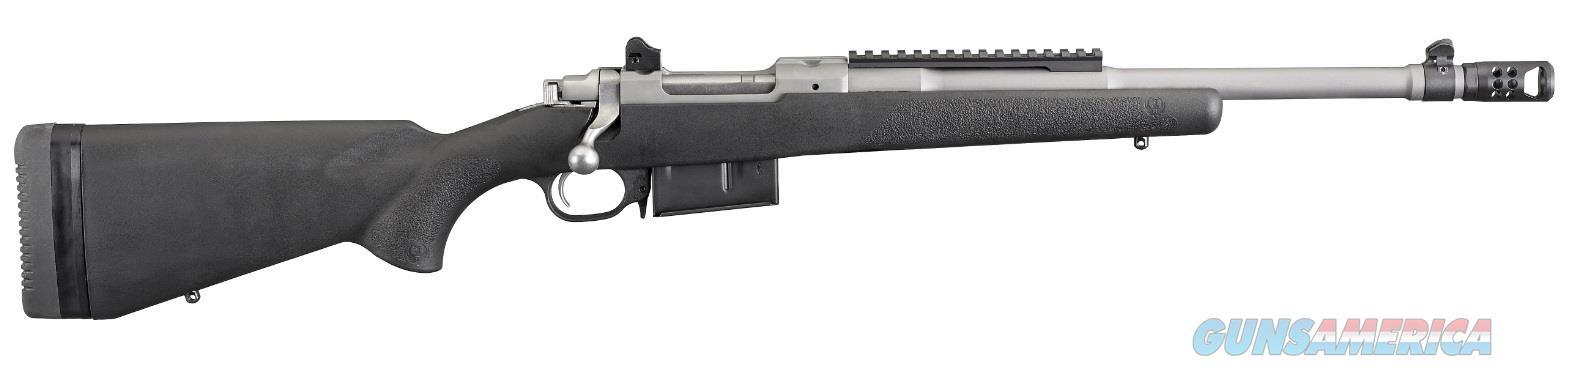 "Ruger 6838 Gunsite Scout Bolt 450 Bushmaster 16.1"" 4+1 Synthetic Black Stk Stainless Steel  Guns > Rifles > R Misc Rifles"